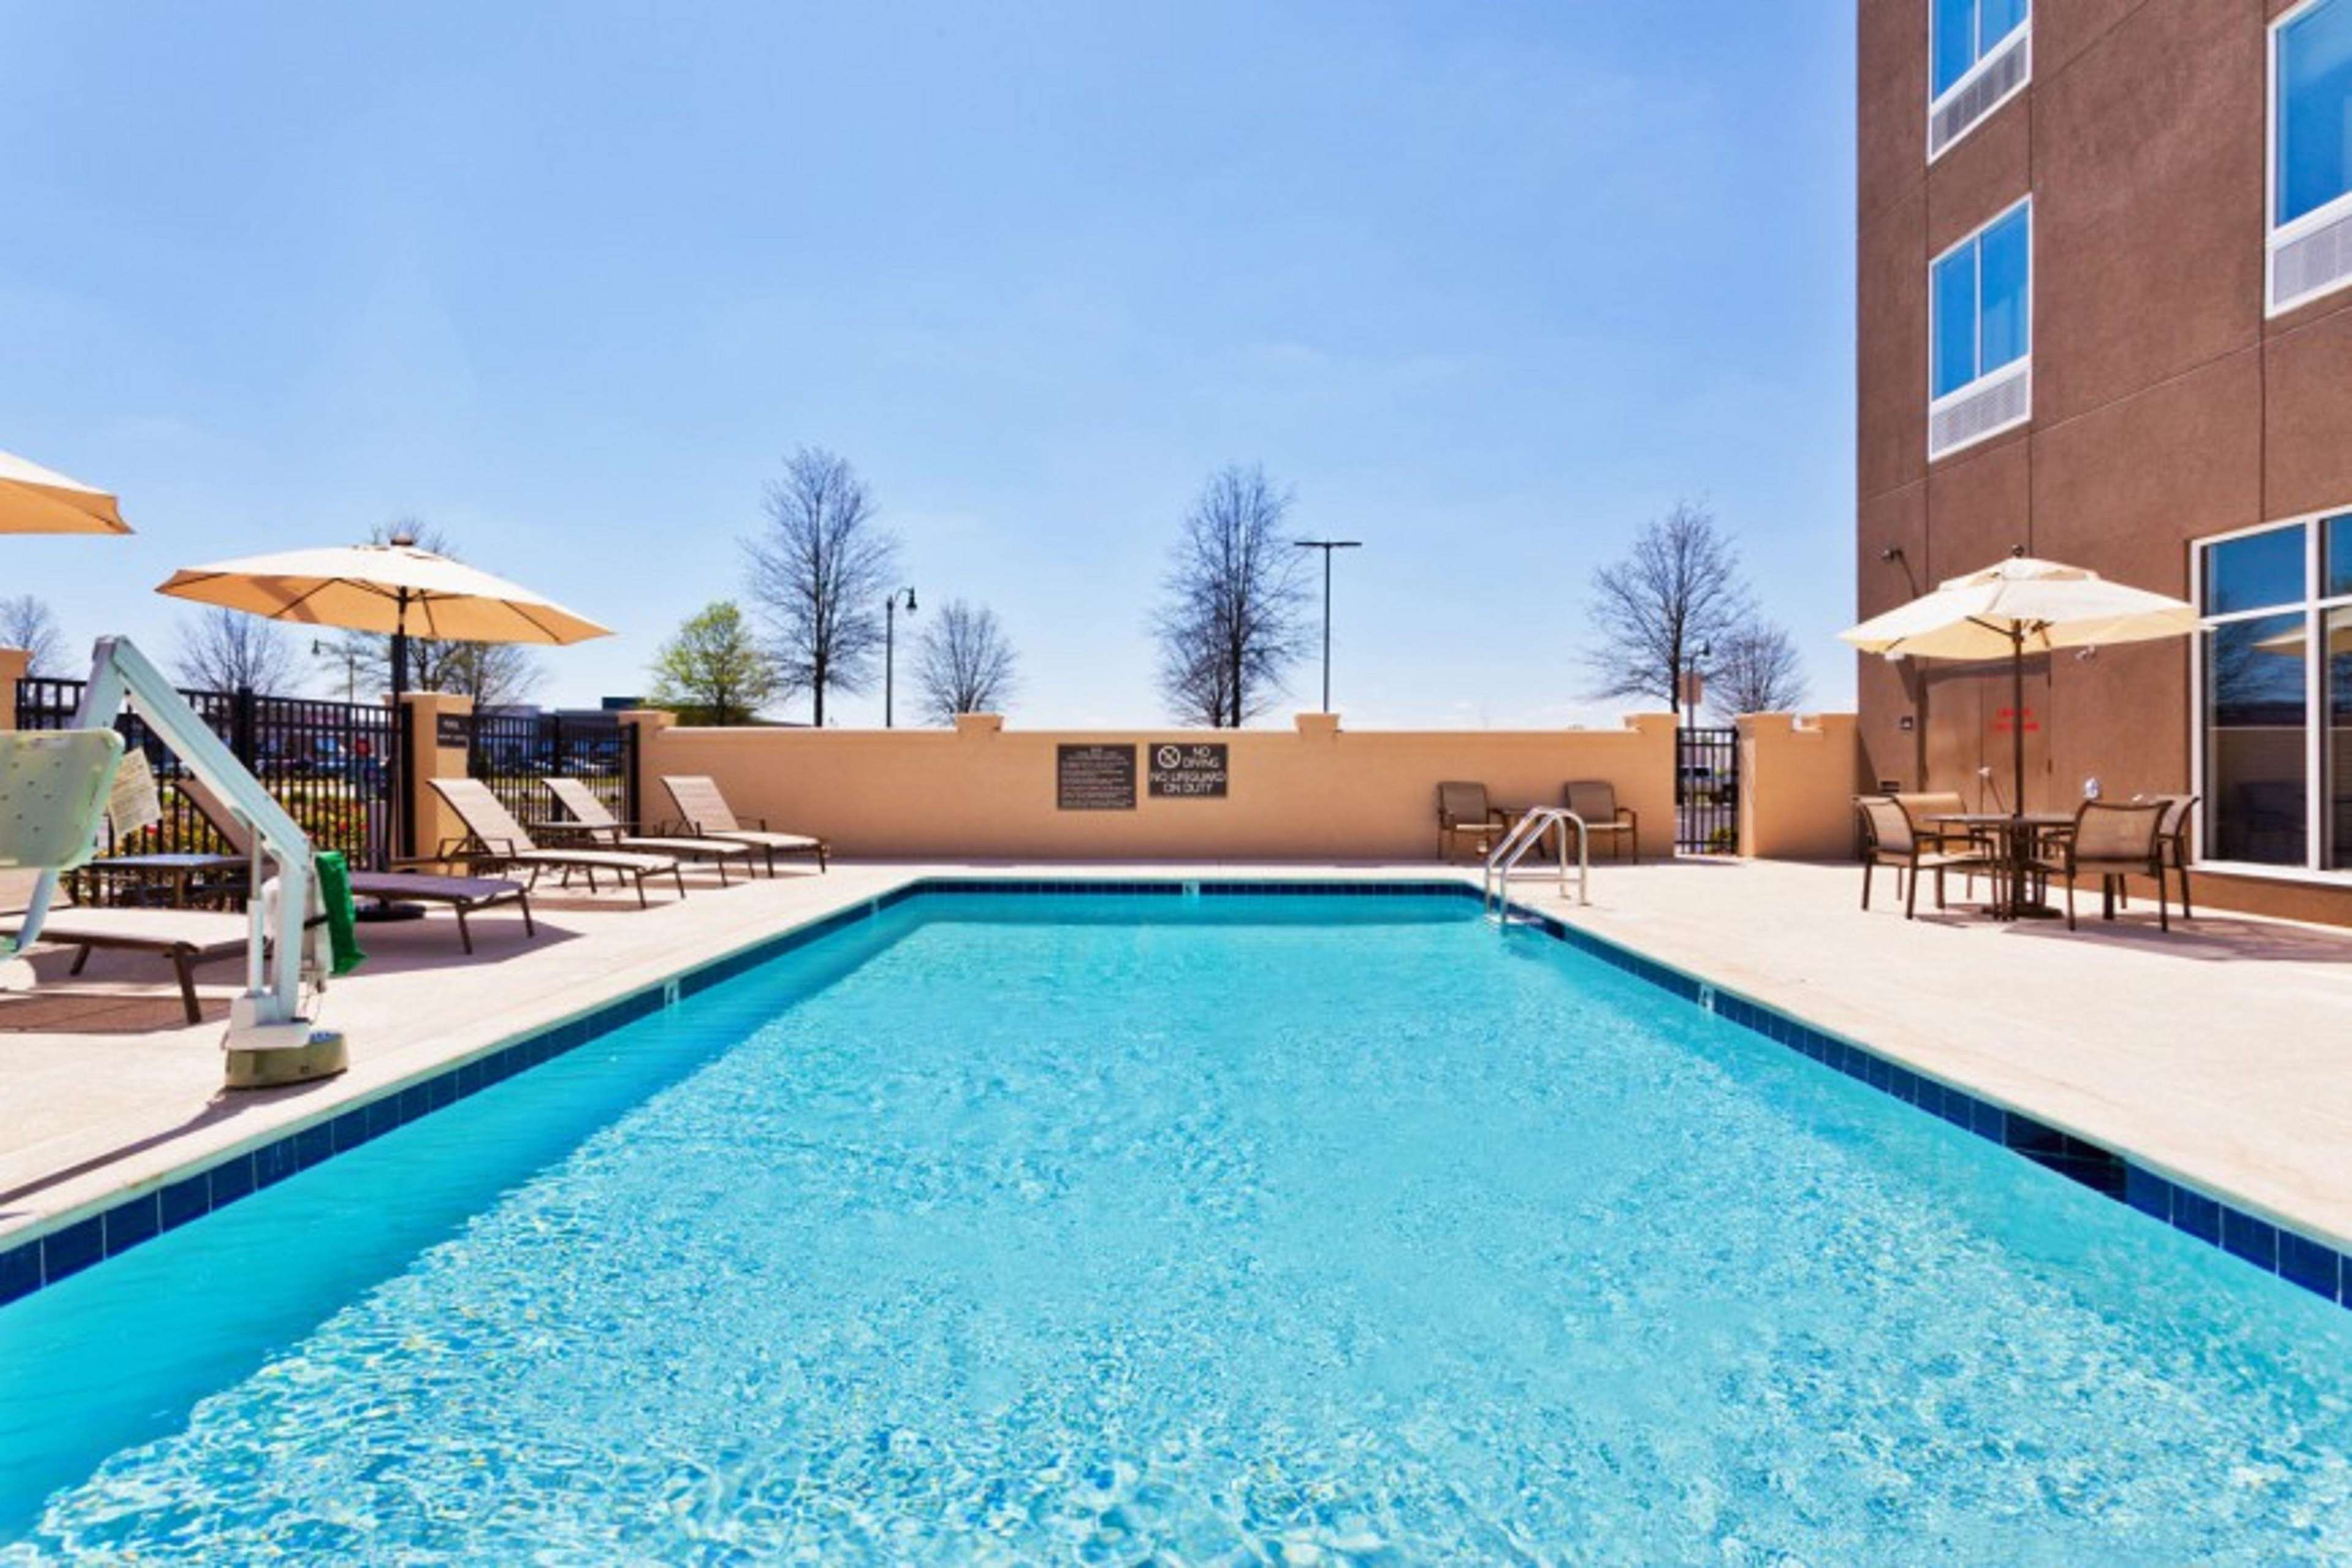 Hilton Garden Inn Montgomery Eastchase 7665 Eastchase Parkway